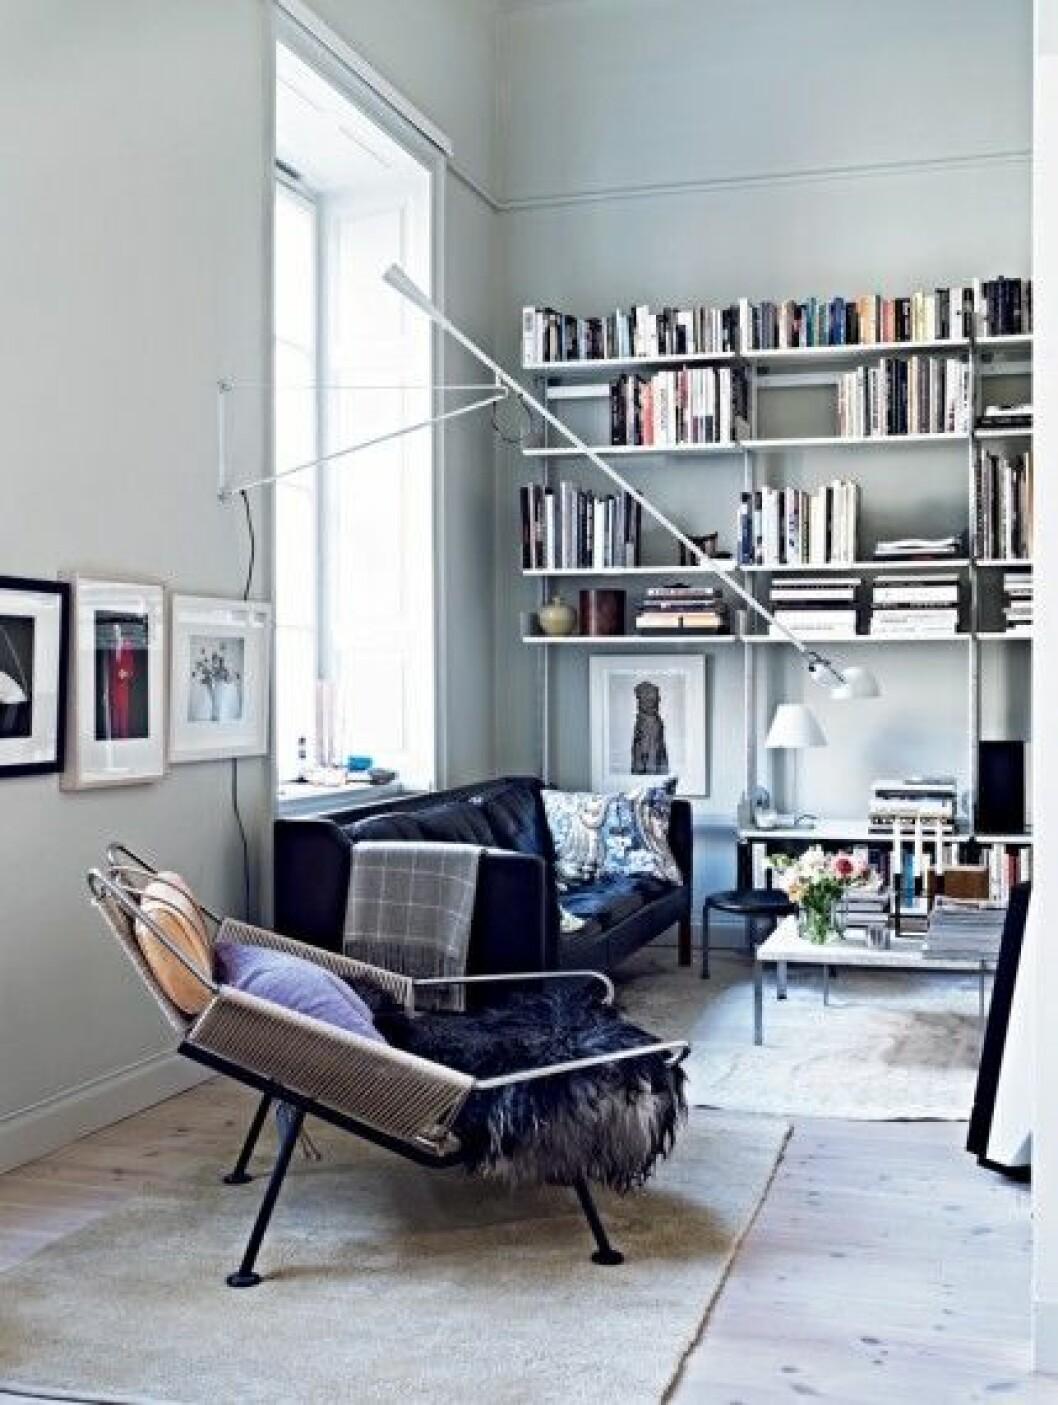 Pa-klassisk-mark-vardagsrum,-bokhylla-2